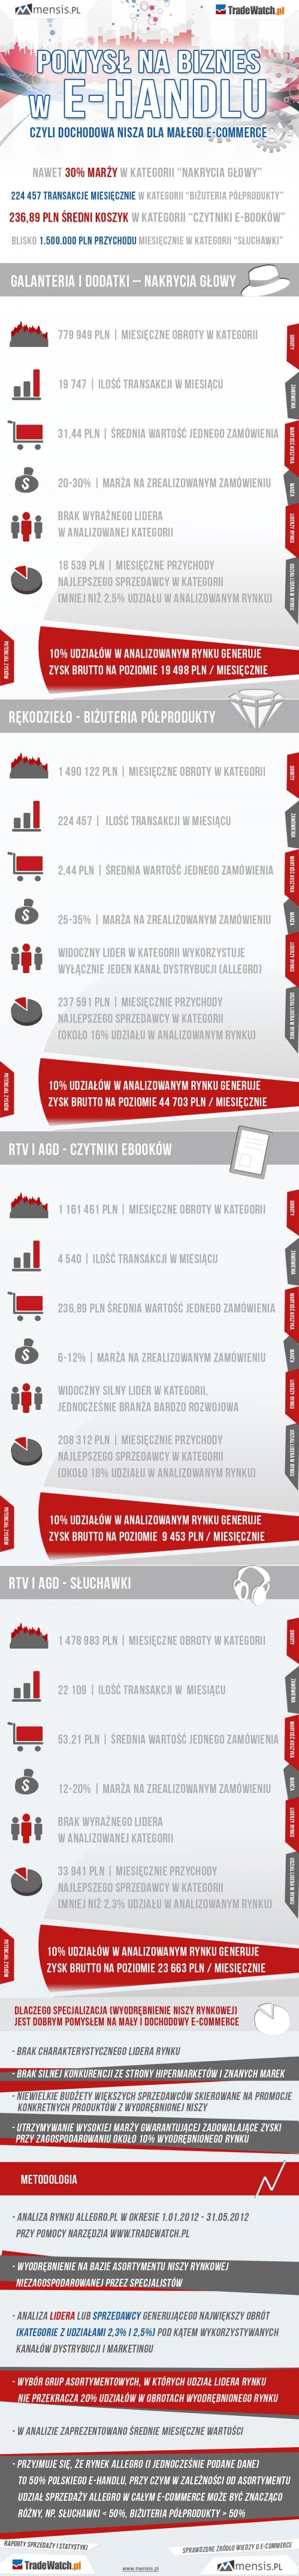 Najbardziej Interesujace Kategorie Allegro Allegro E Handel Marketing Inphographic Infografika Infographic Online Marketing Social Media